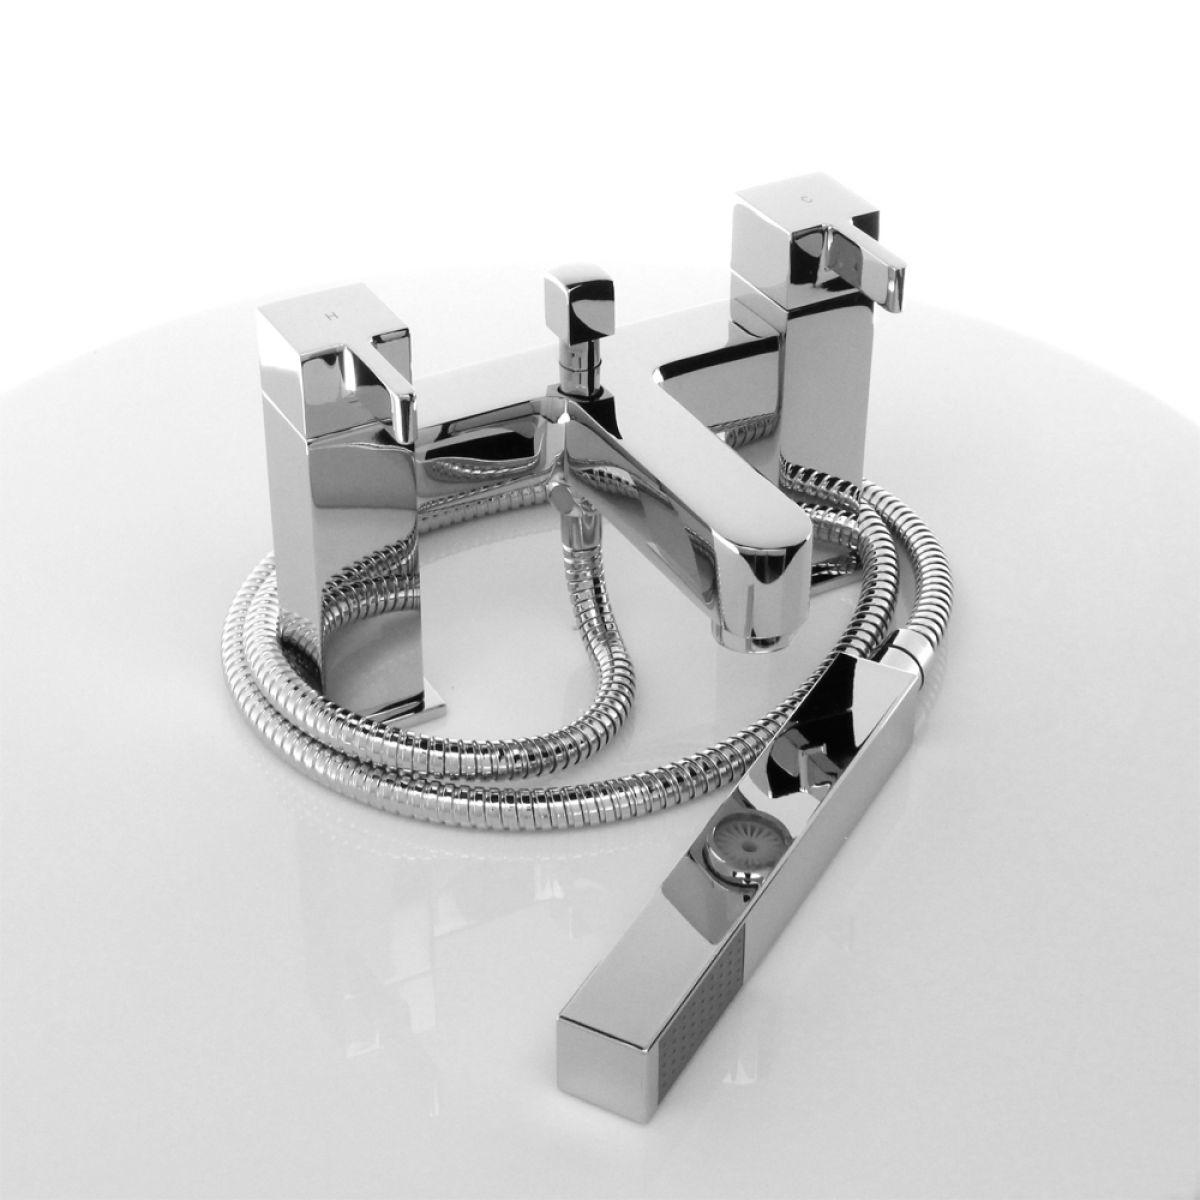 Zenith Edge Bath Shower Mixer Tap